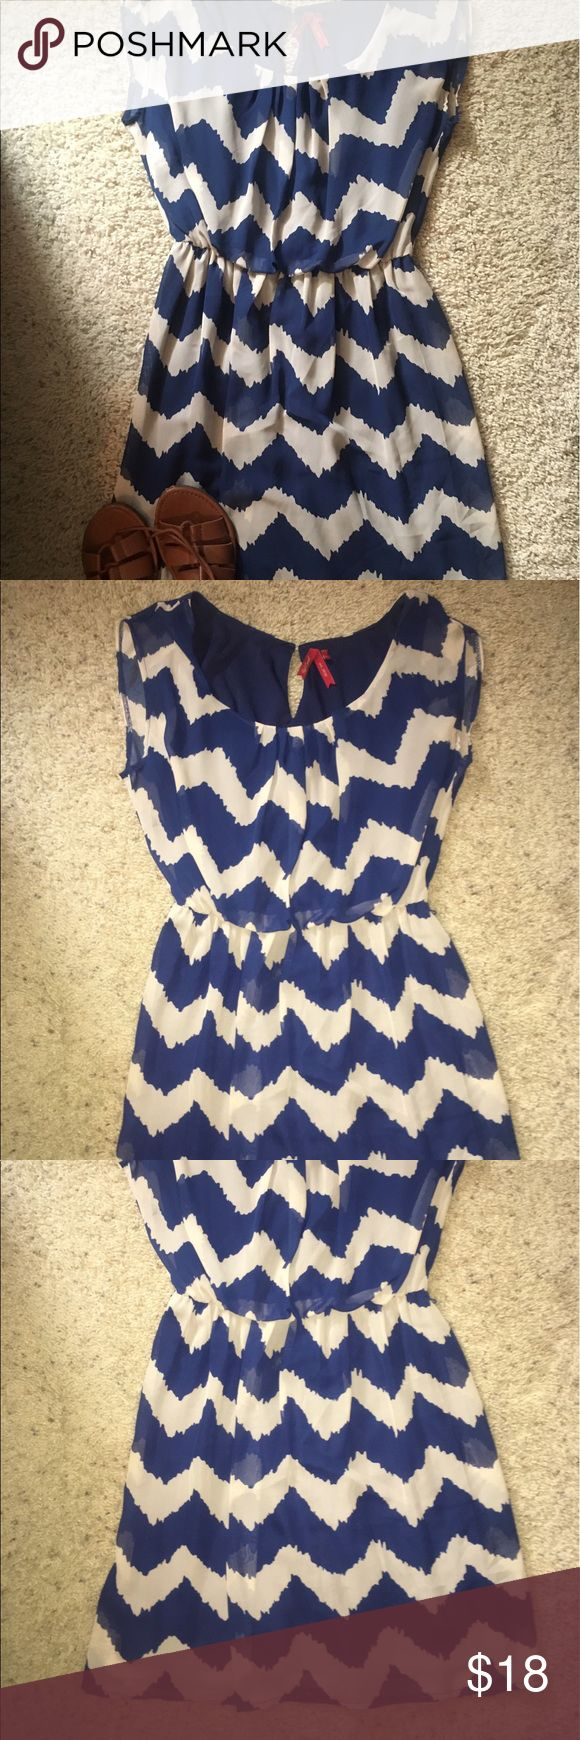 Blue & Cream Chevron Print Dress Blue and cream chevron print dress with waistband Red Camel Dresses Mini